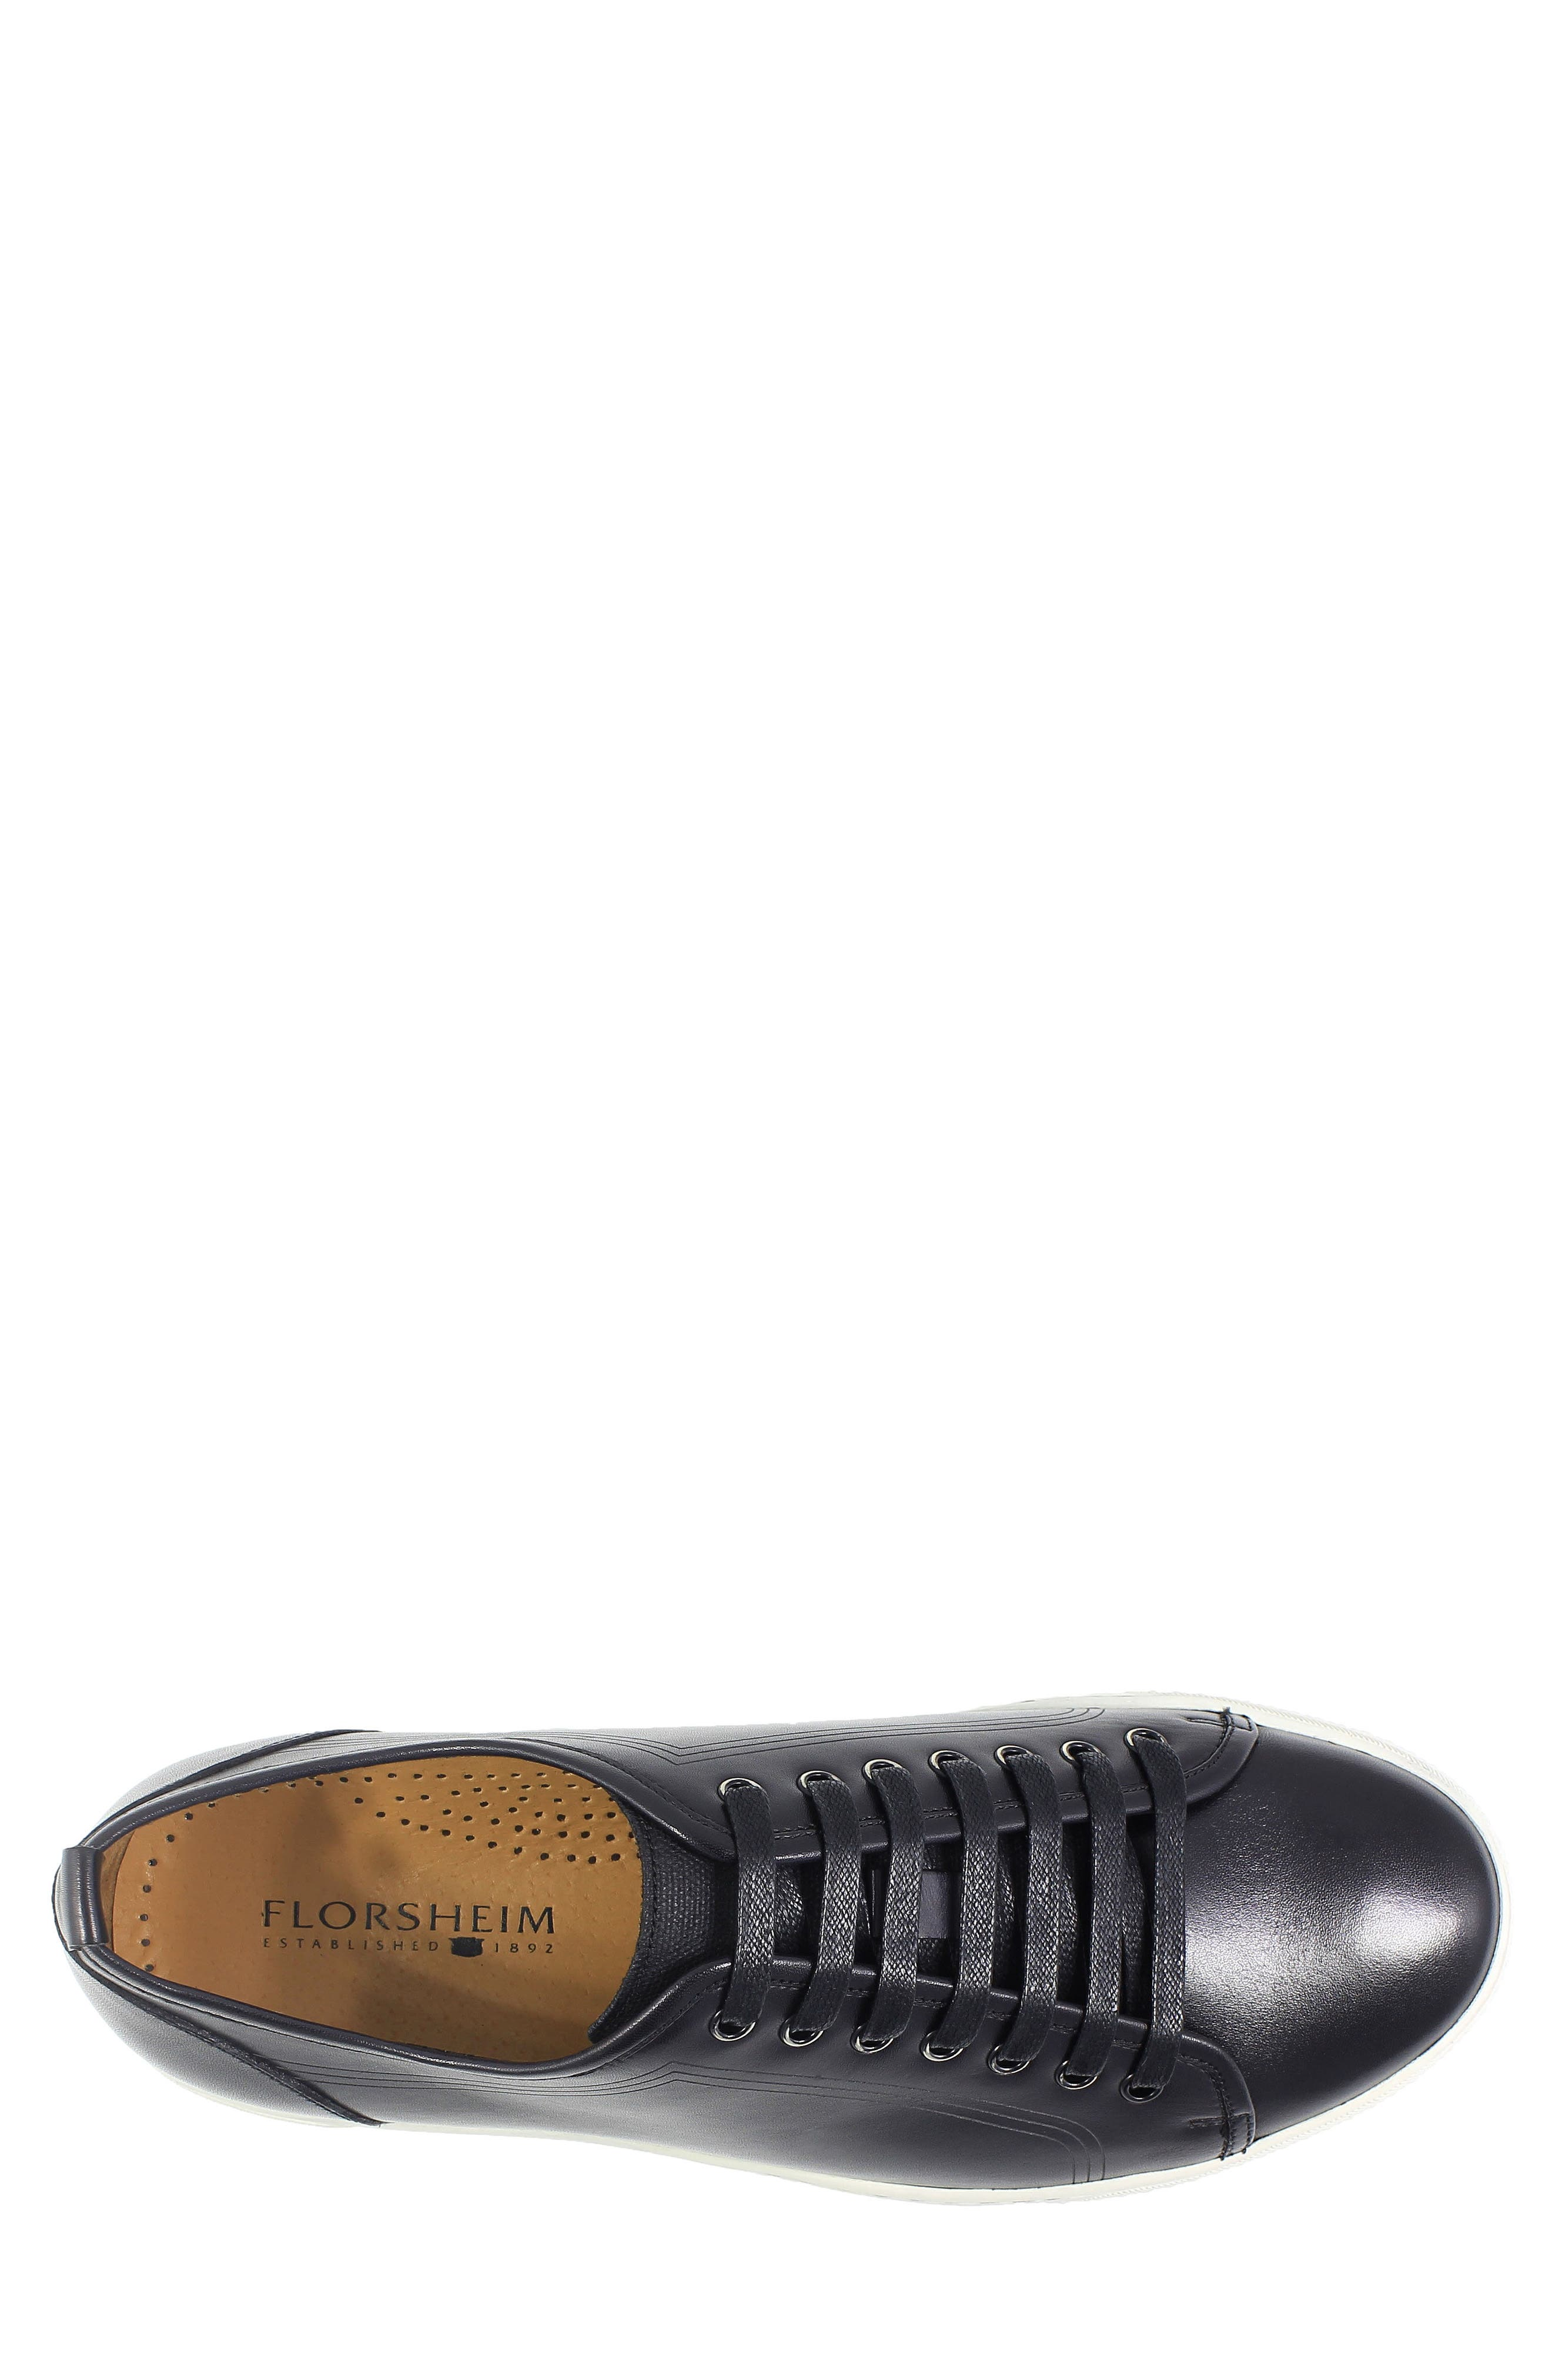 Forward Lo Sneaker,                             Alternate thumbnail 3, color,                             Black/ White Leather